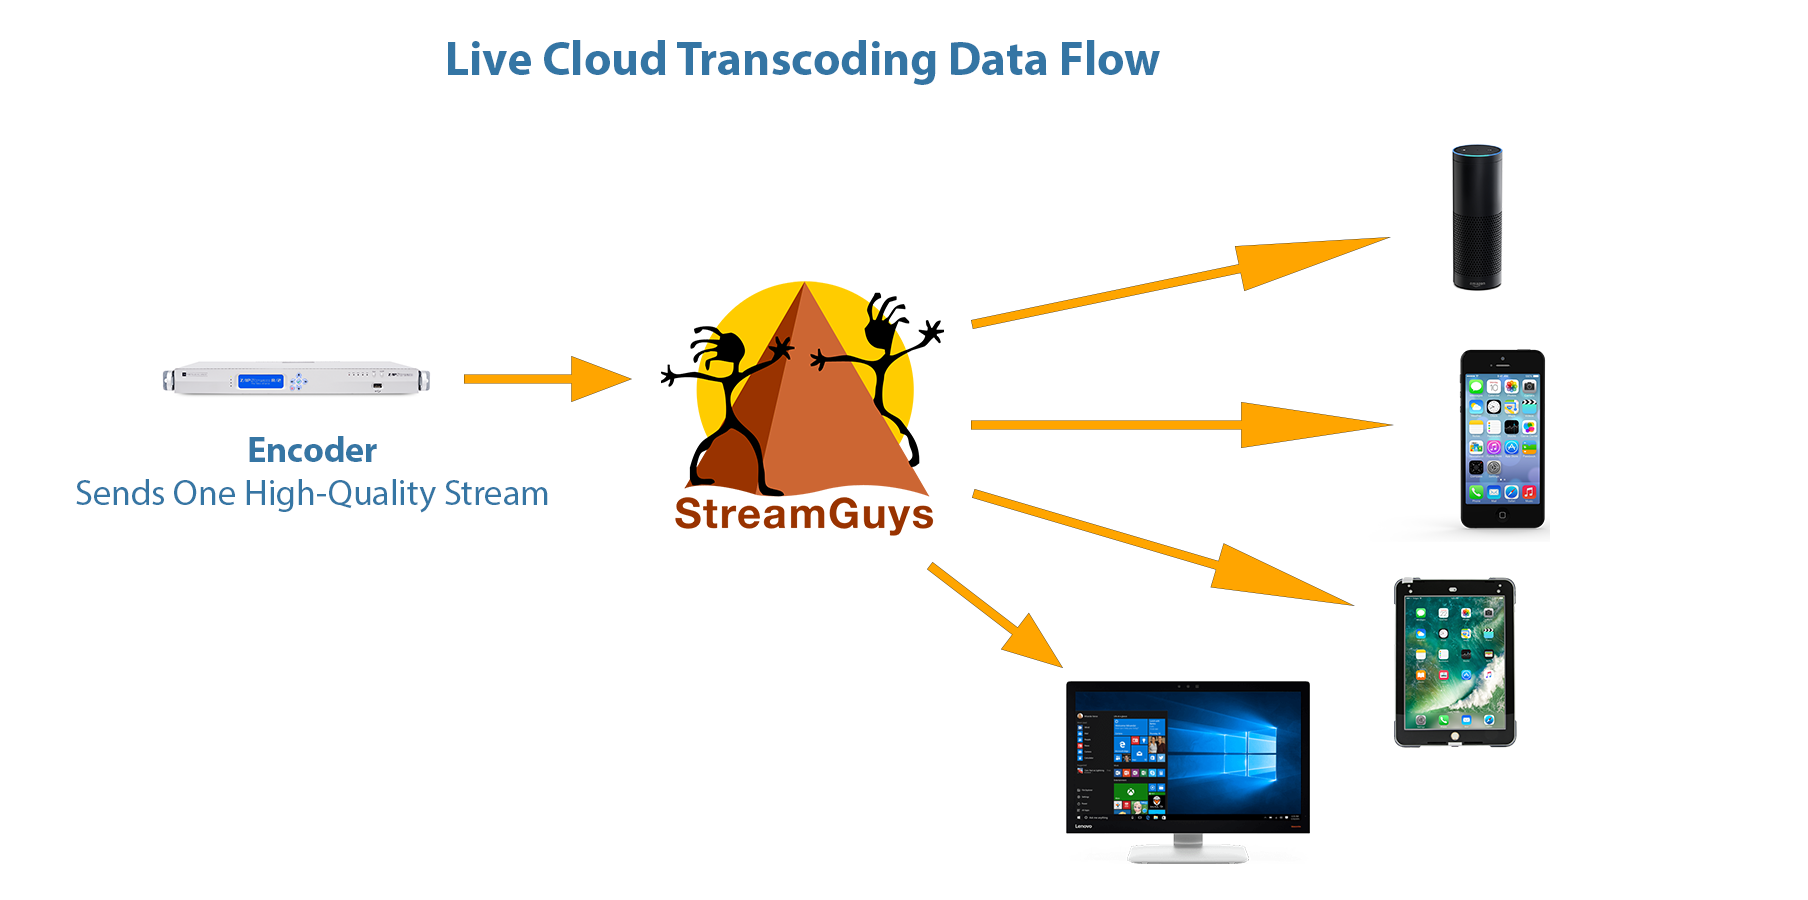 Transcoding Graphic